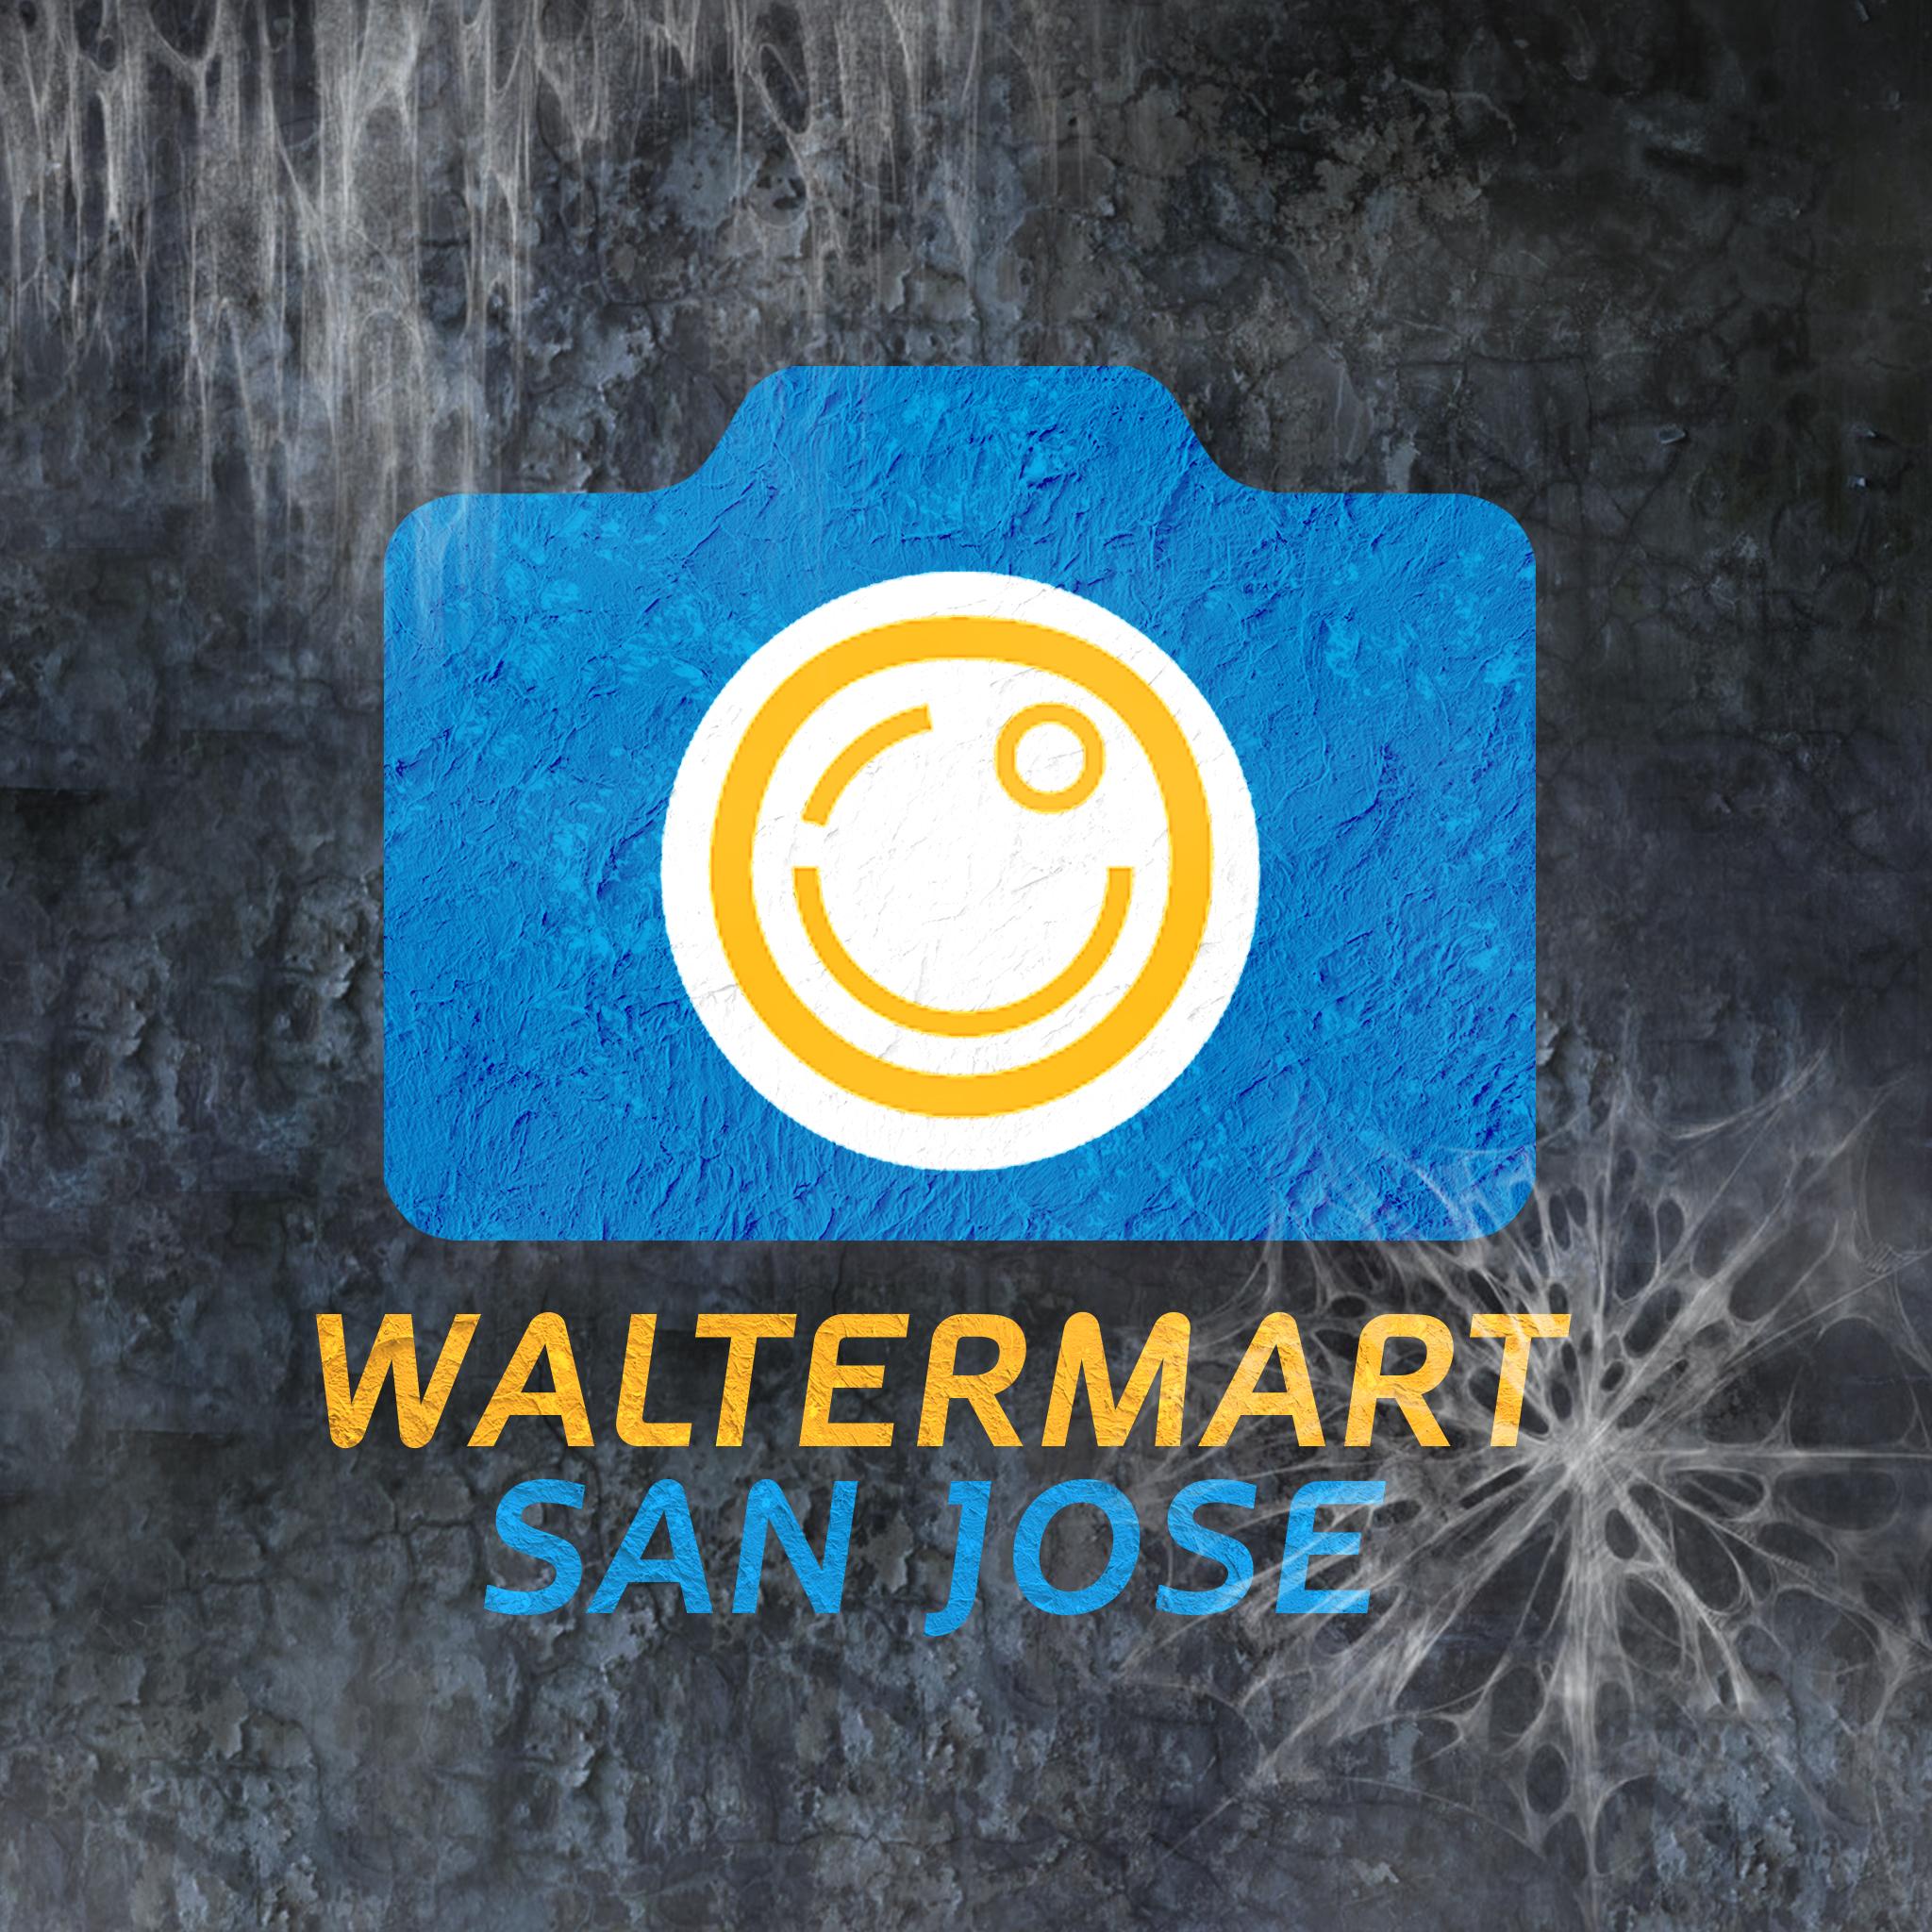 Picture City (Waltermart San Jose)